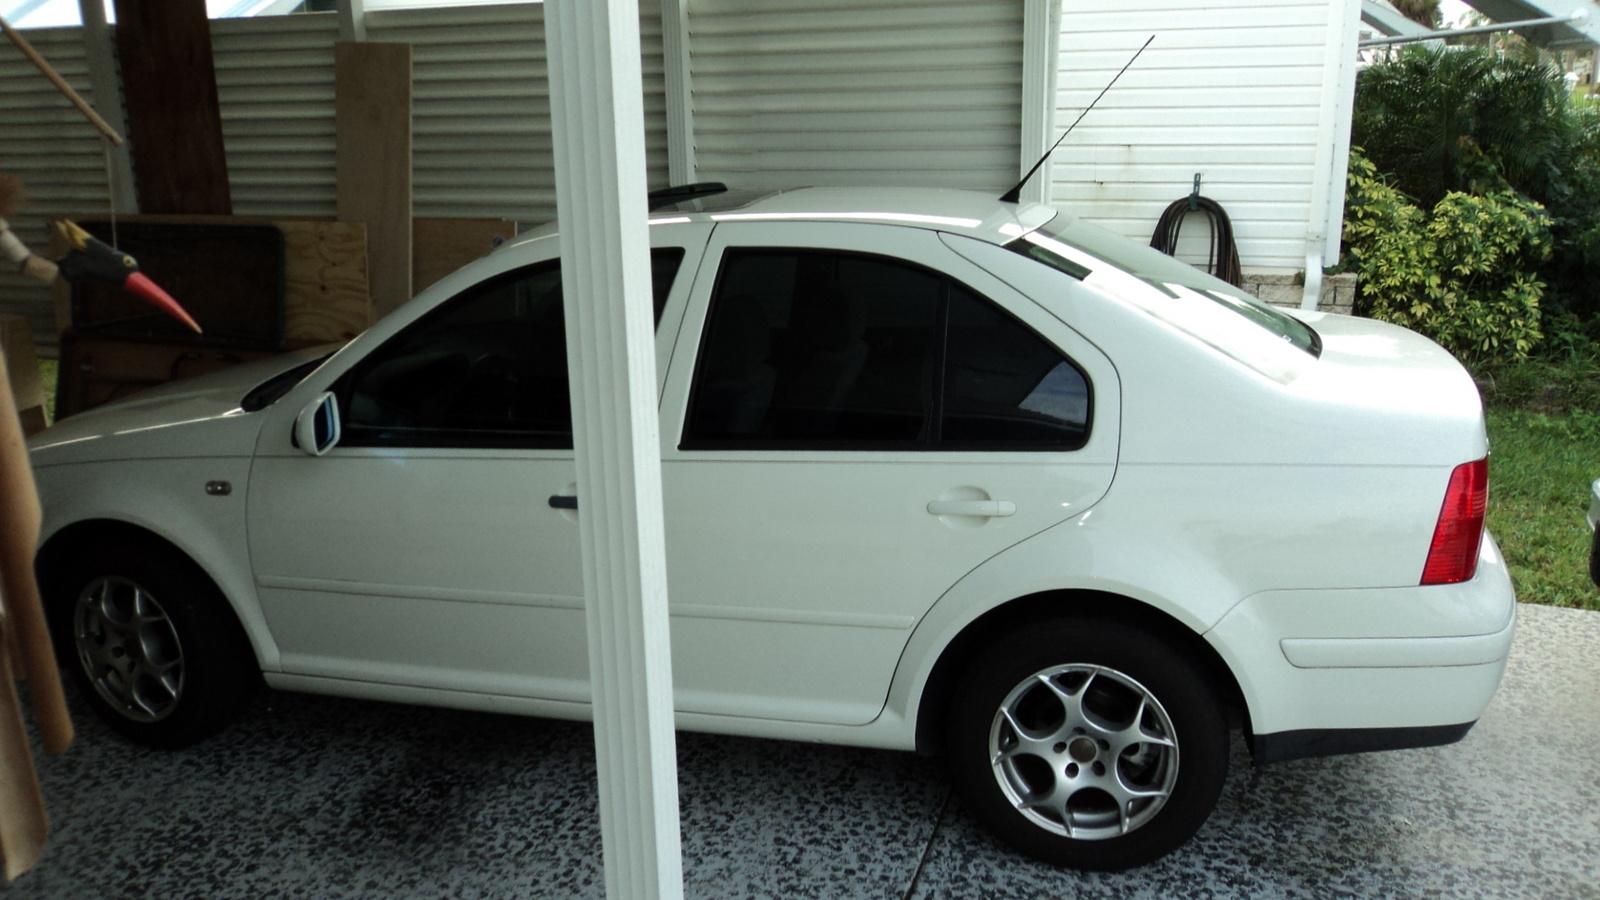 Volkswagen jetta questions car won t start nor the for 2001 vw jetta window problems